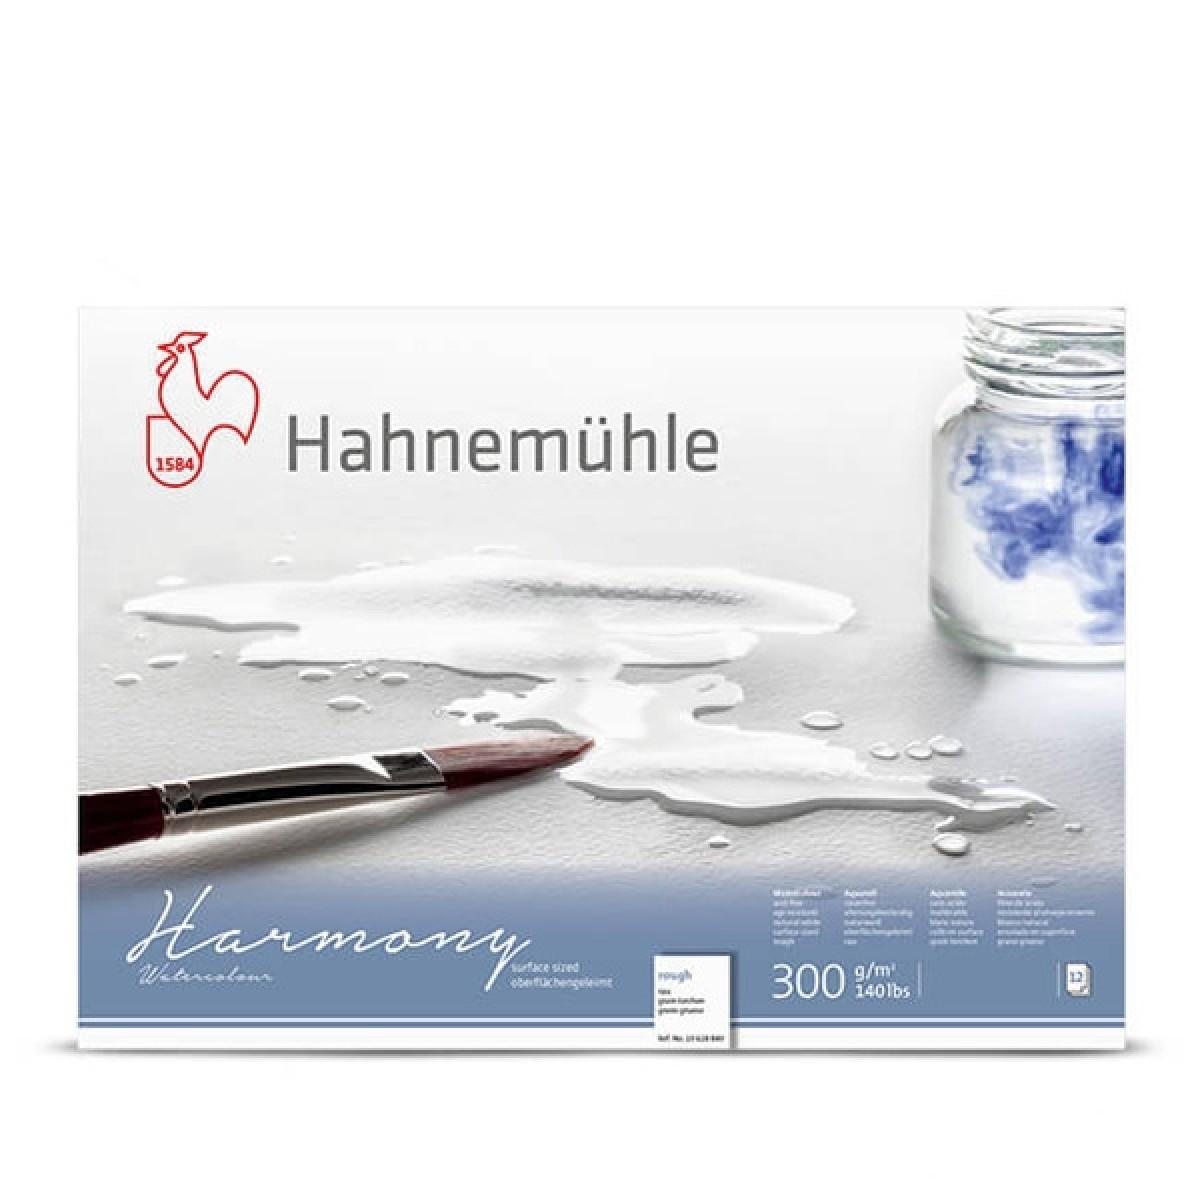 Hahnemühle, Harmony, Akvarel blok, rough, 300gr, A4, 12 ark